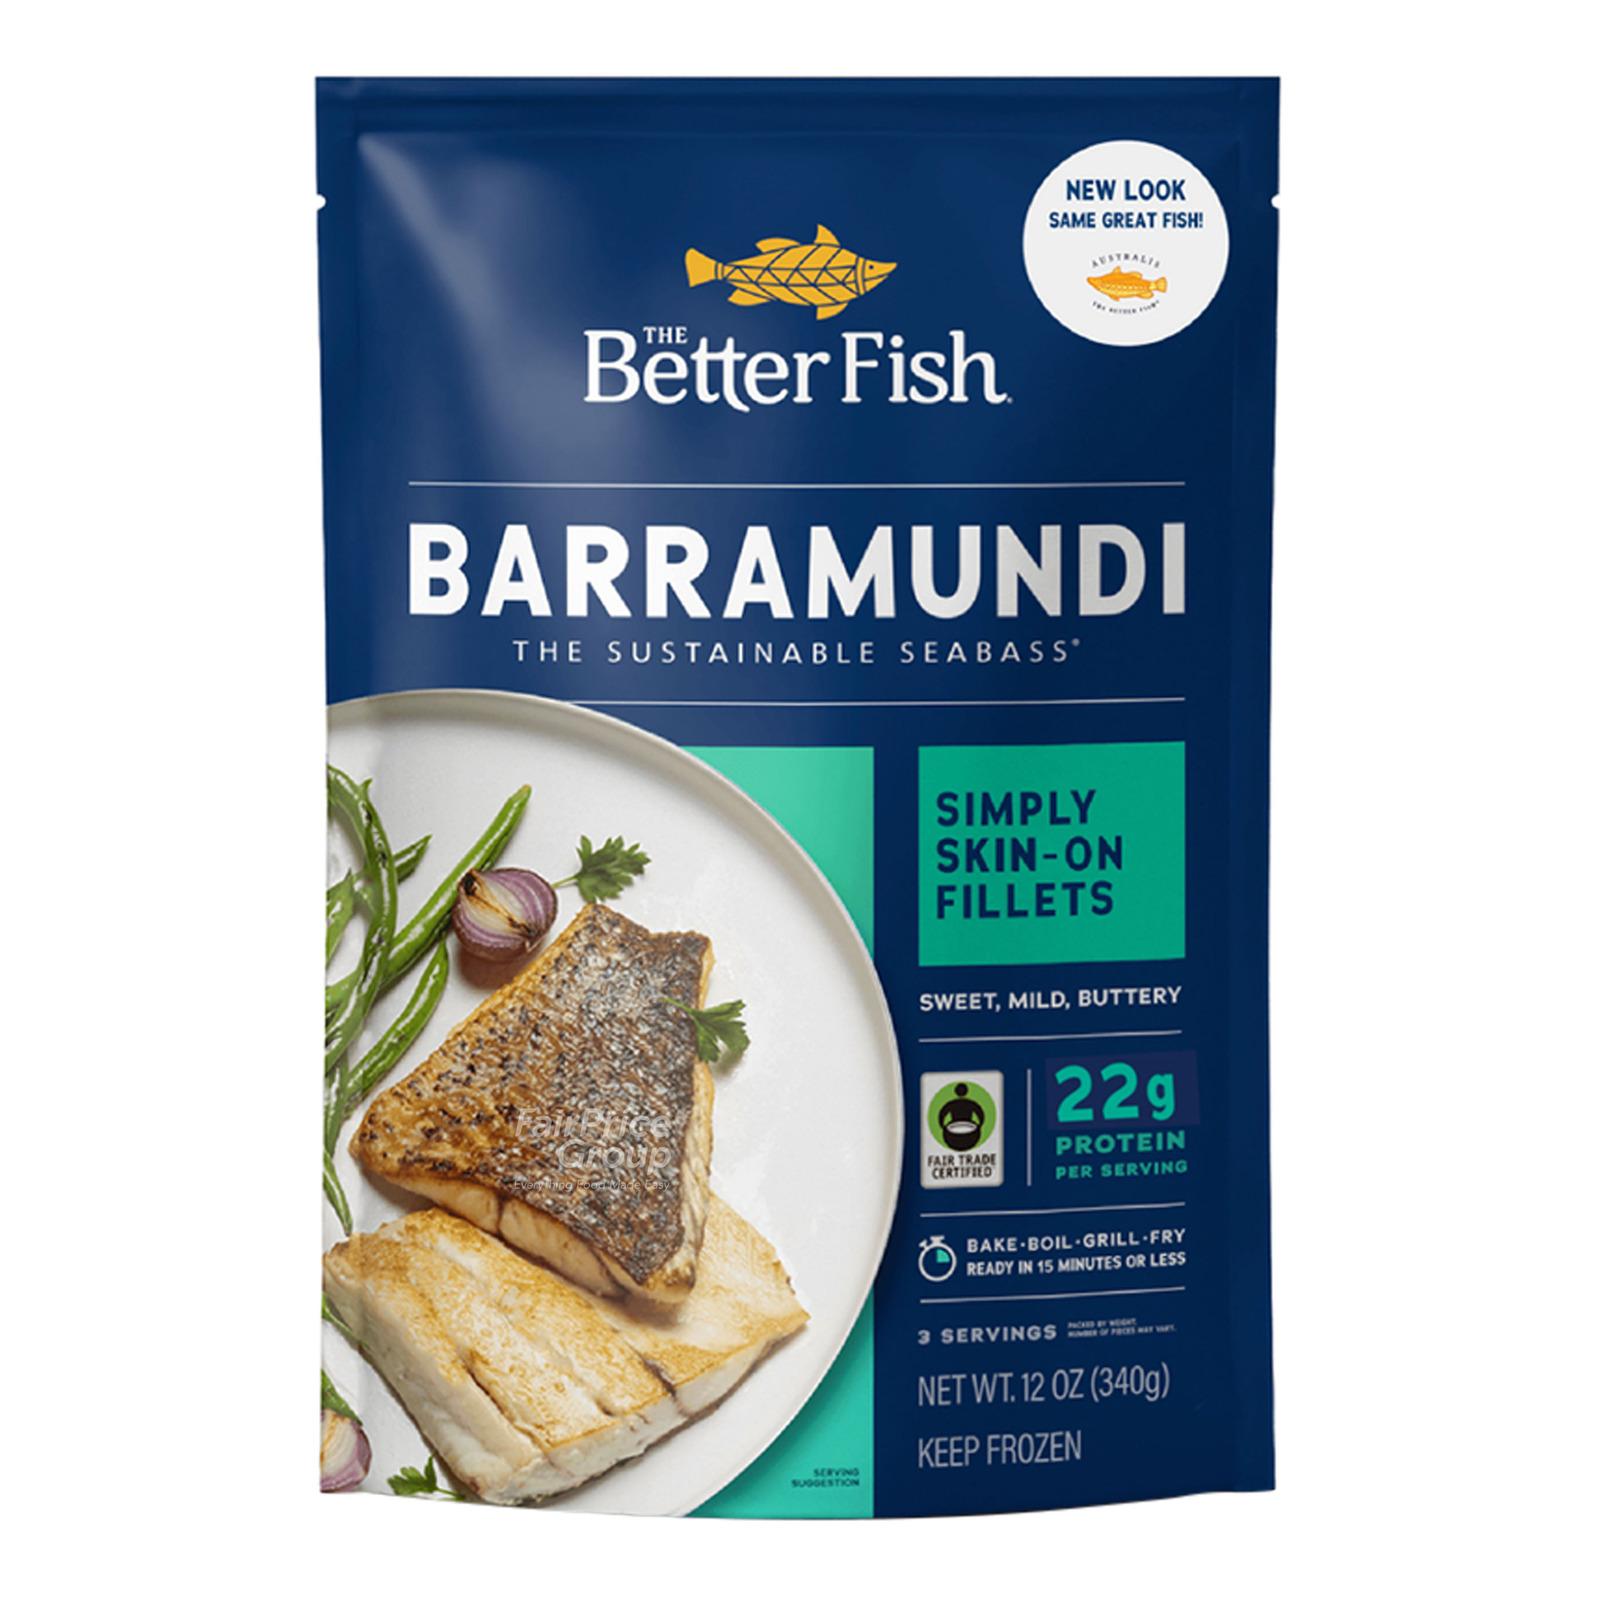 Australis Barramundi Frozen Seabass - All Natural